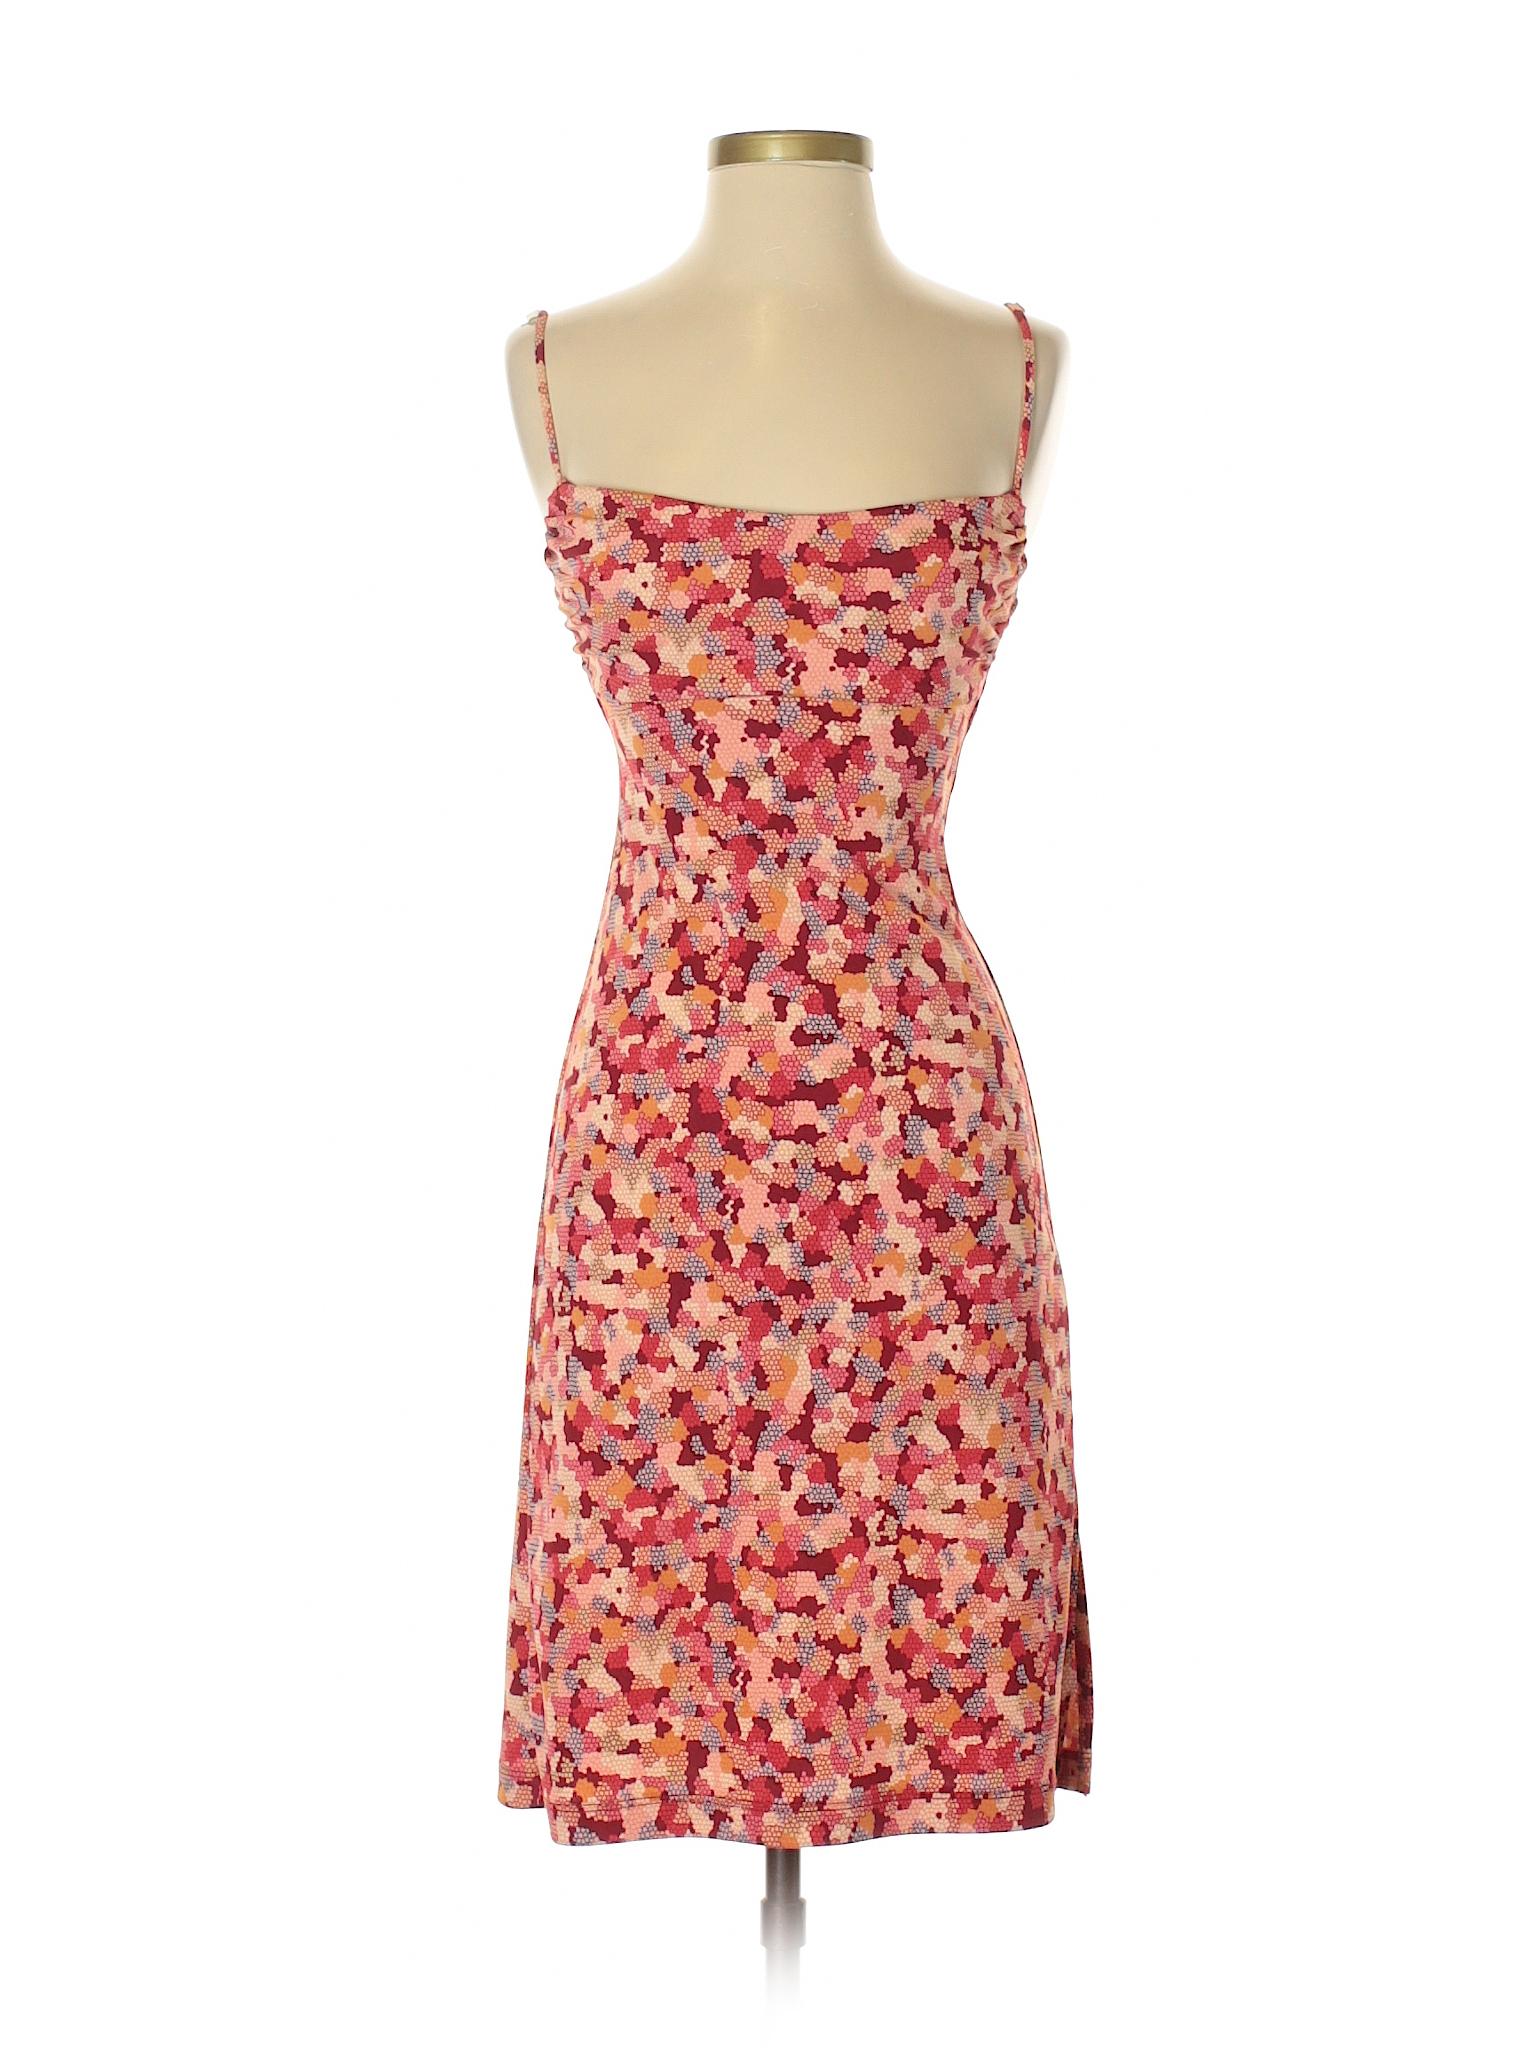 Dress BCBGMAXAZRIA Dress Casual Casual Selling Dress Selling Selling BCBGMAXAZRIA BCBGMAXAZRIA Casual gn88qHv